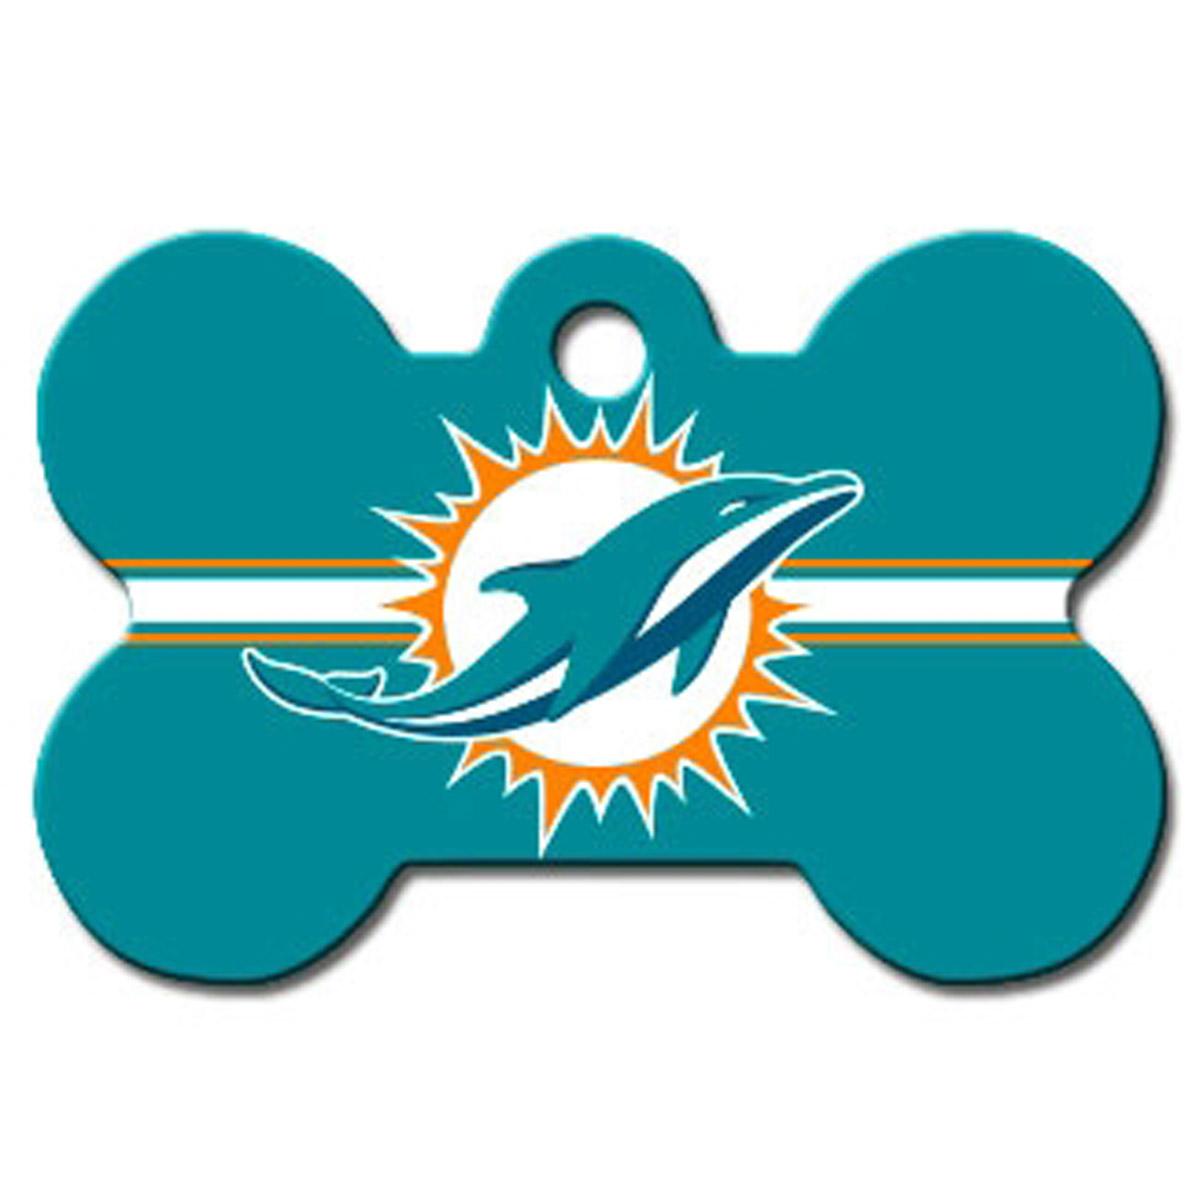 Miami Dolphins Engravable Pet I.D. Tag - Bone